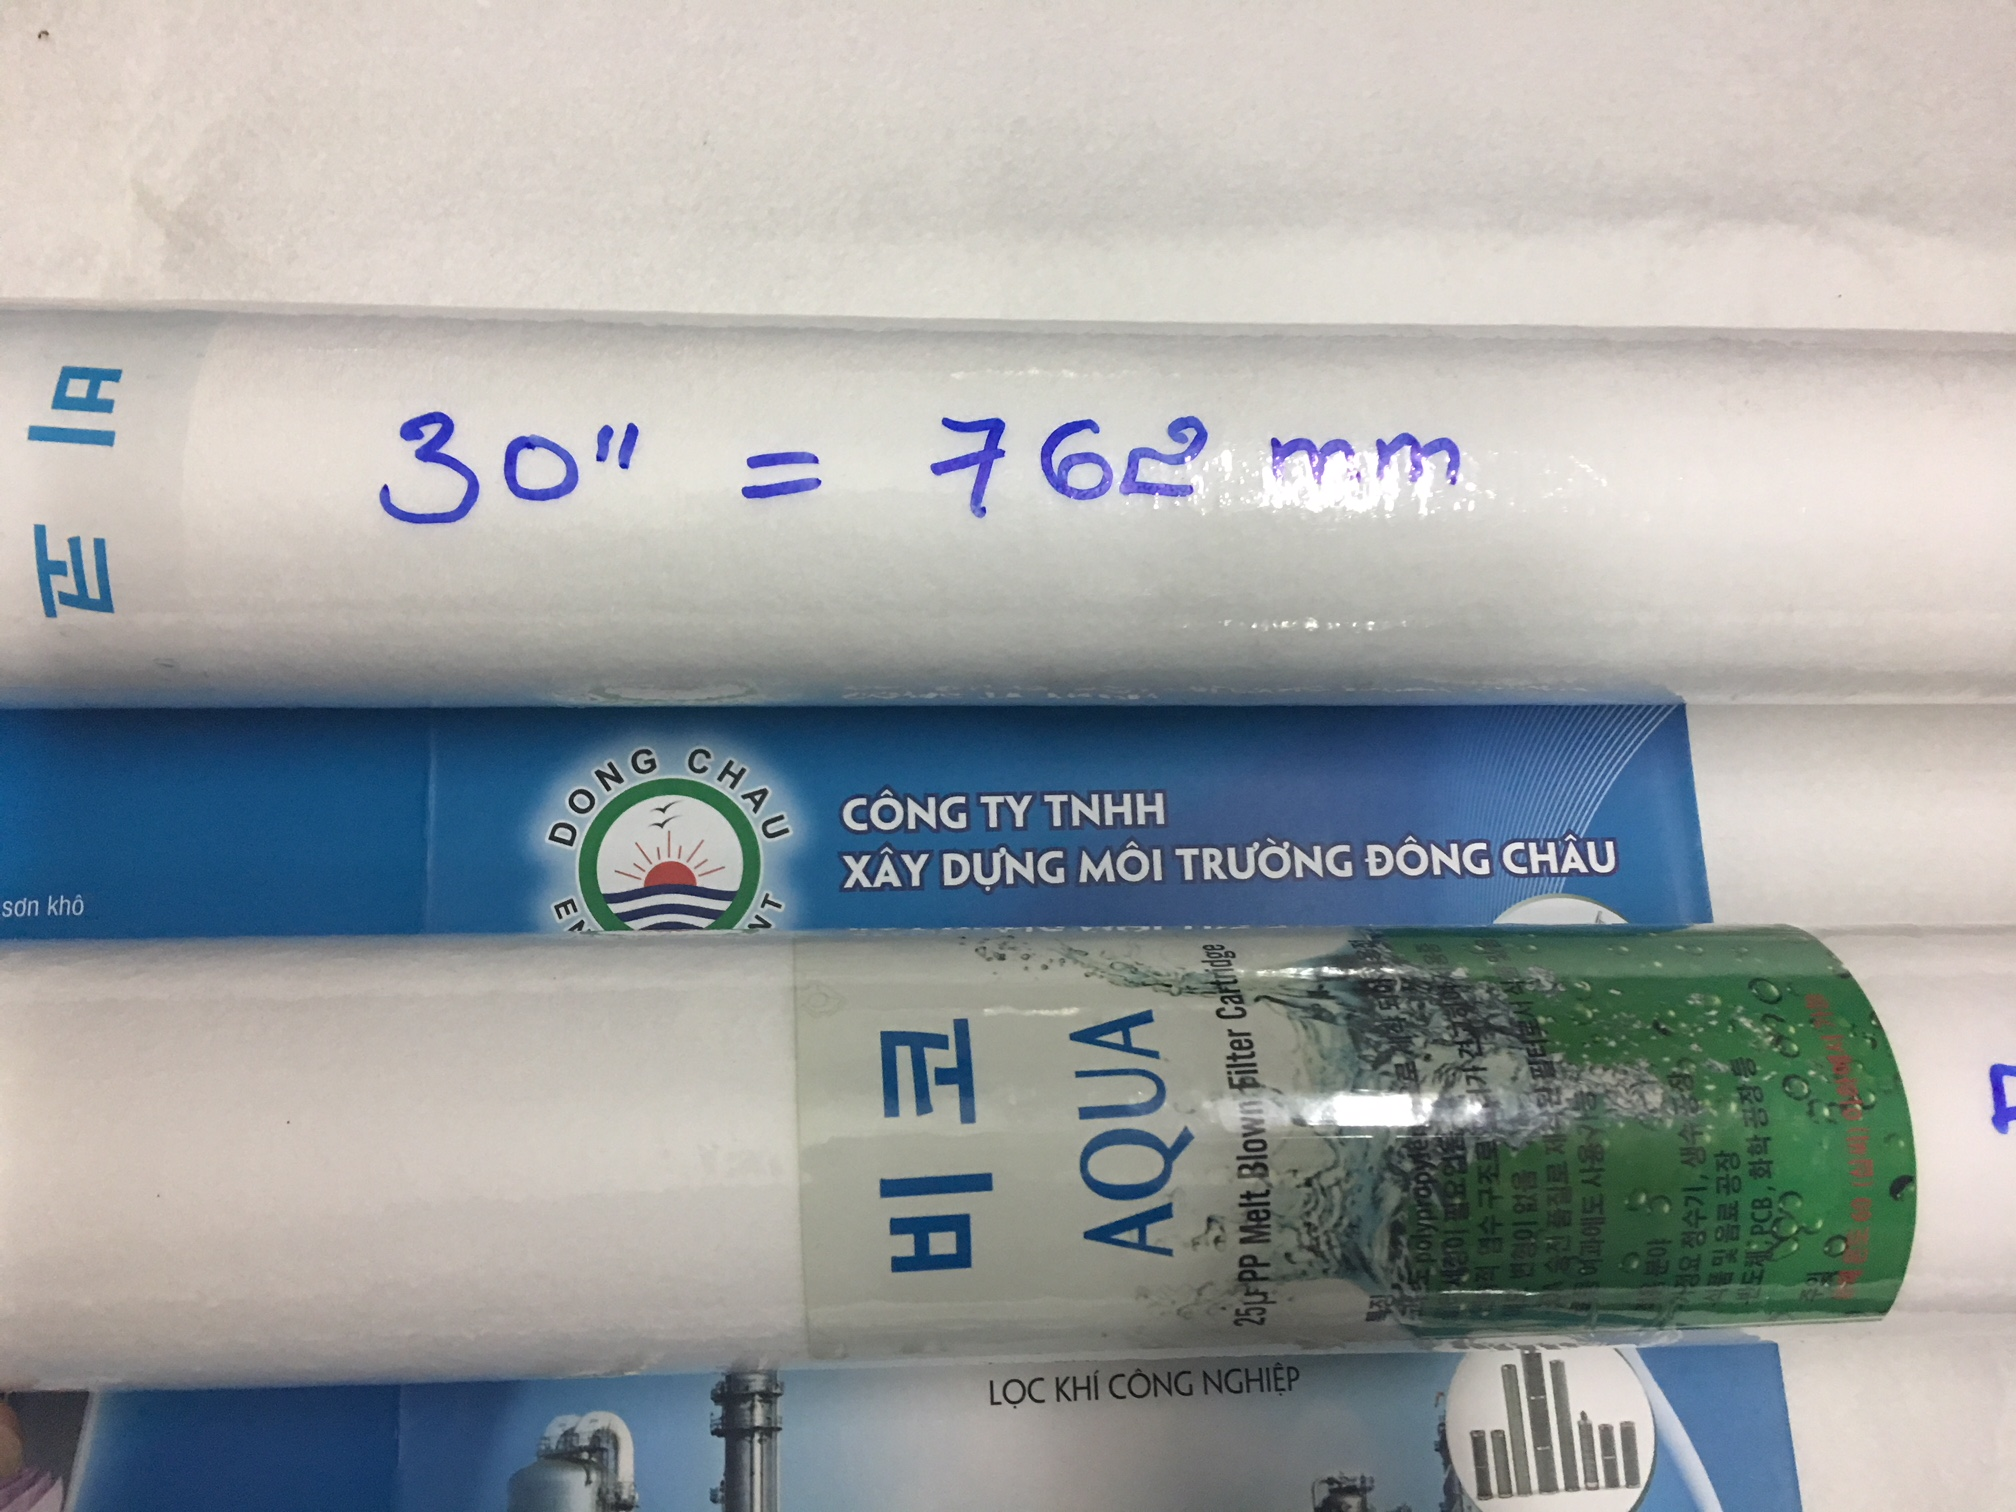 Lõi lọc nén Aqua 50 micron 30 inch